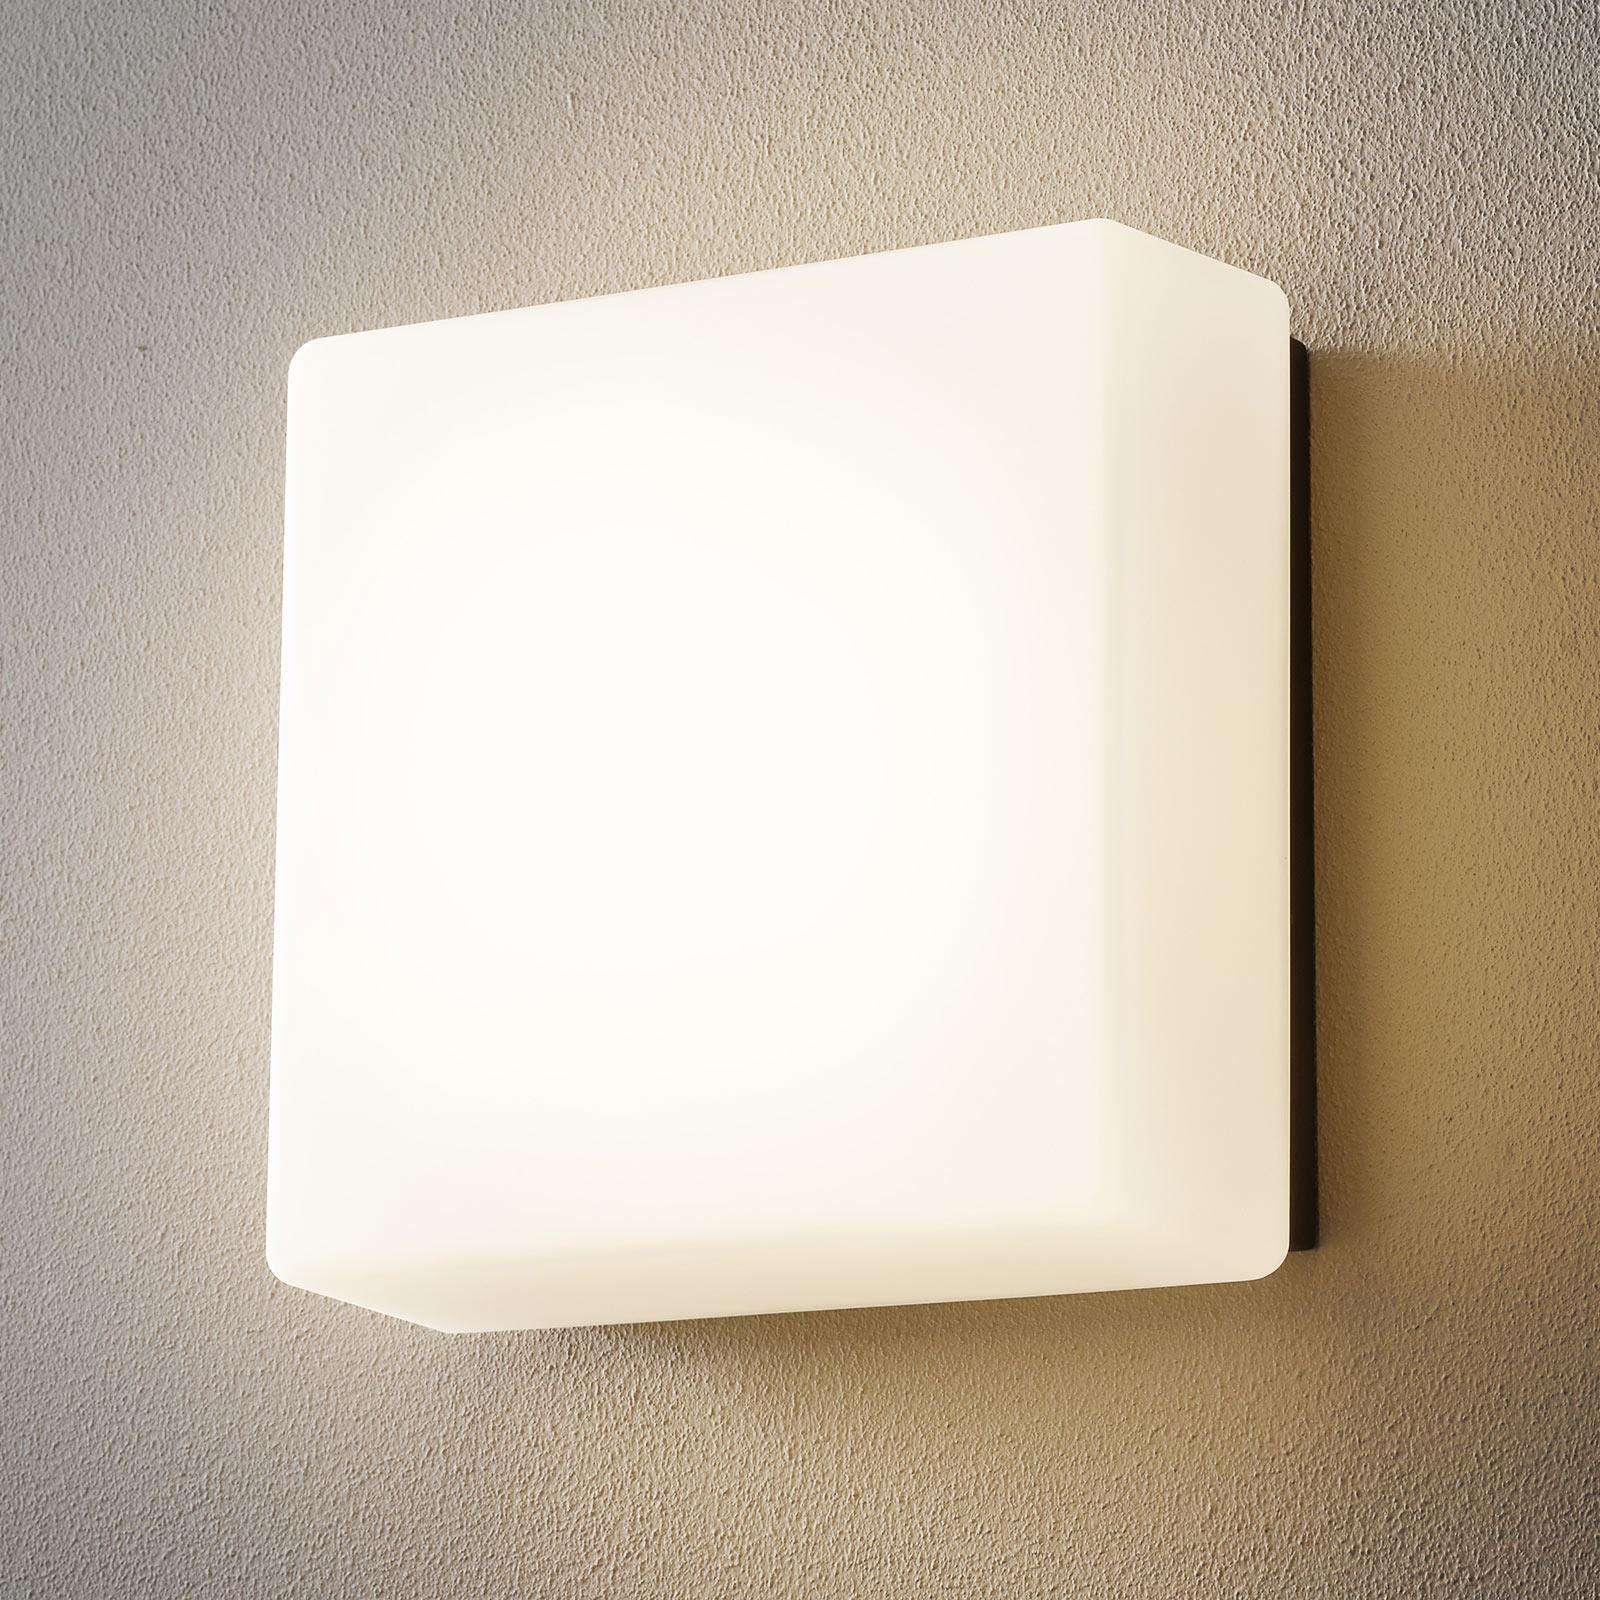 BEGA lichtbouwsteen 38301 LED wandlamp 28x28 cm